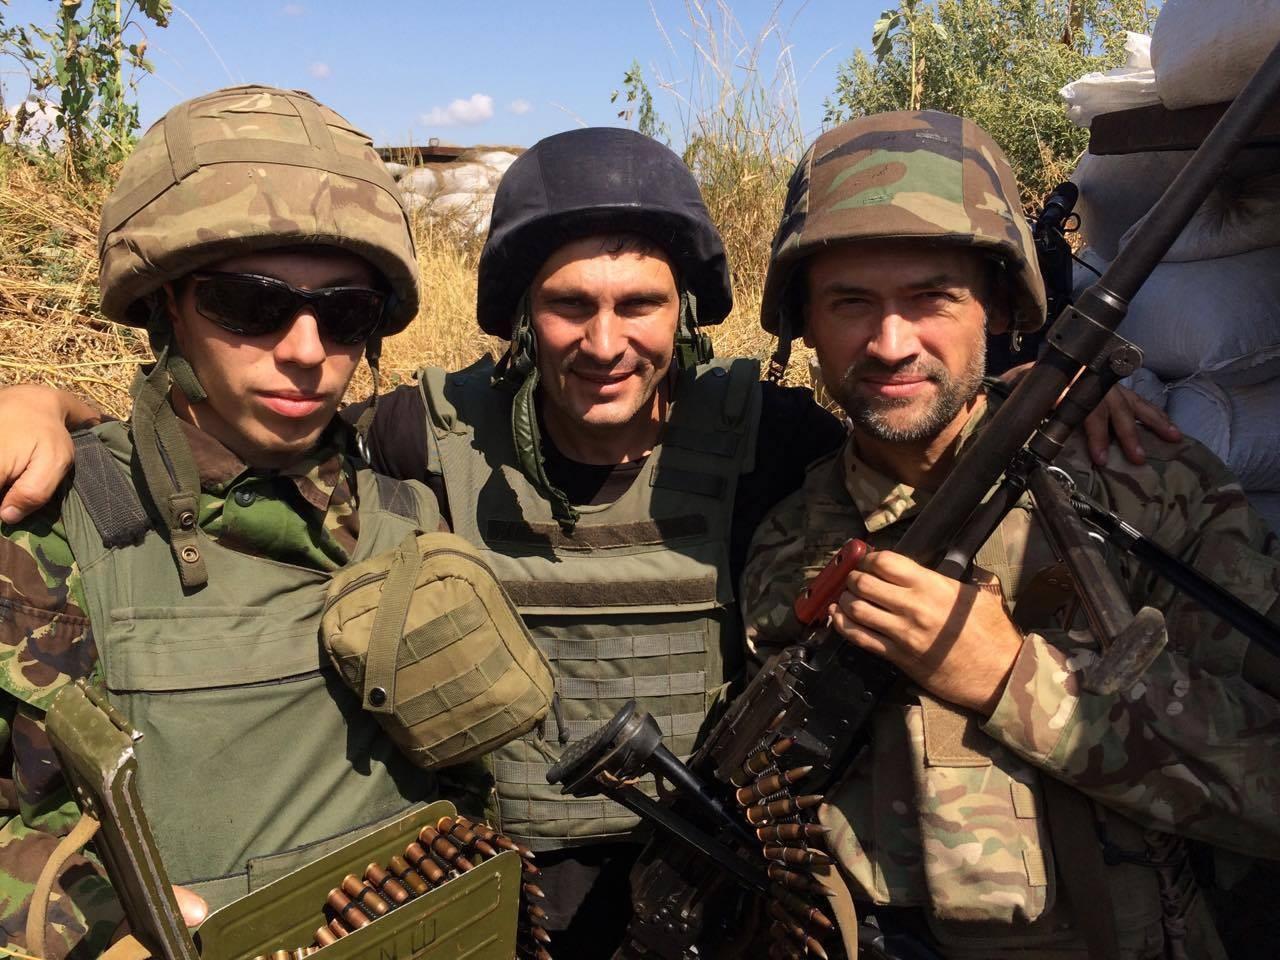 Russian war movie star now fighting for Ukraine - Aug  25